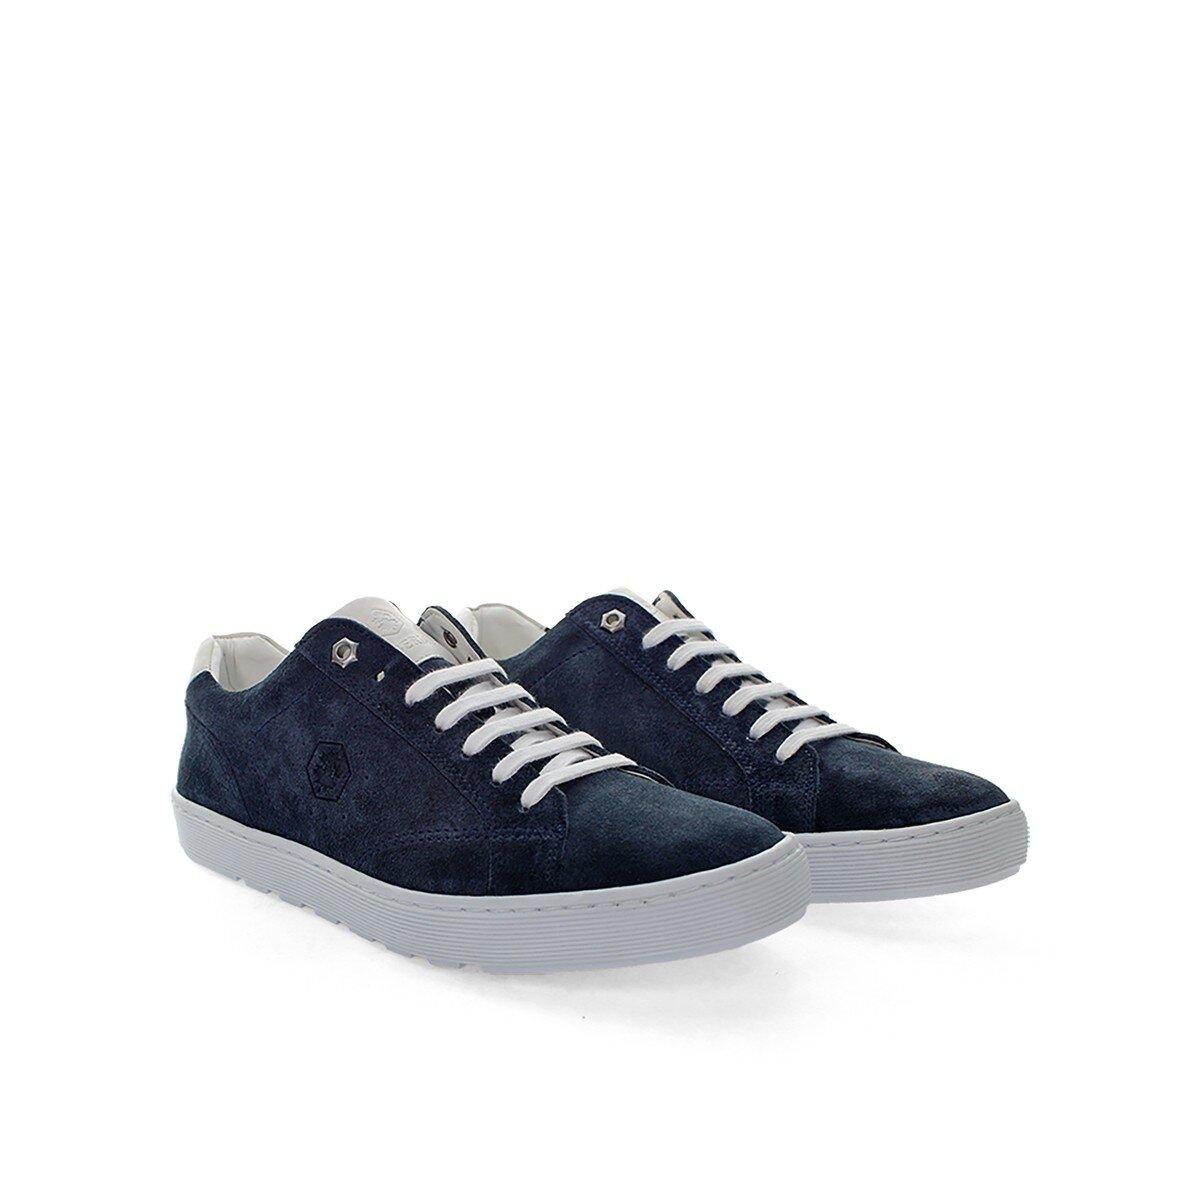 WARD Sneakers Uomo